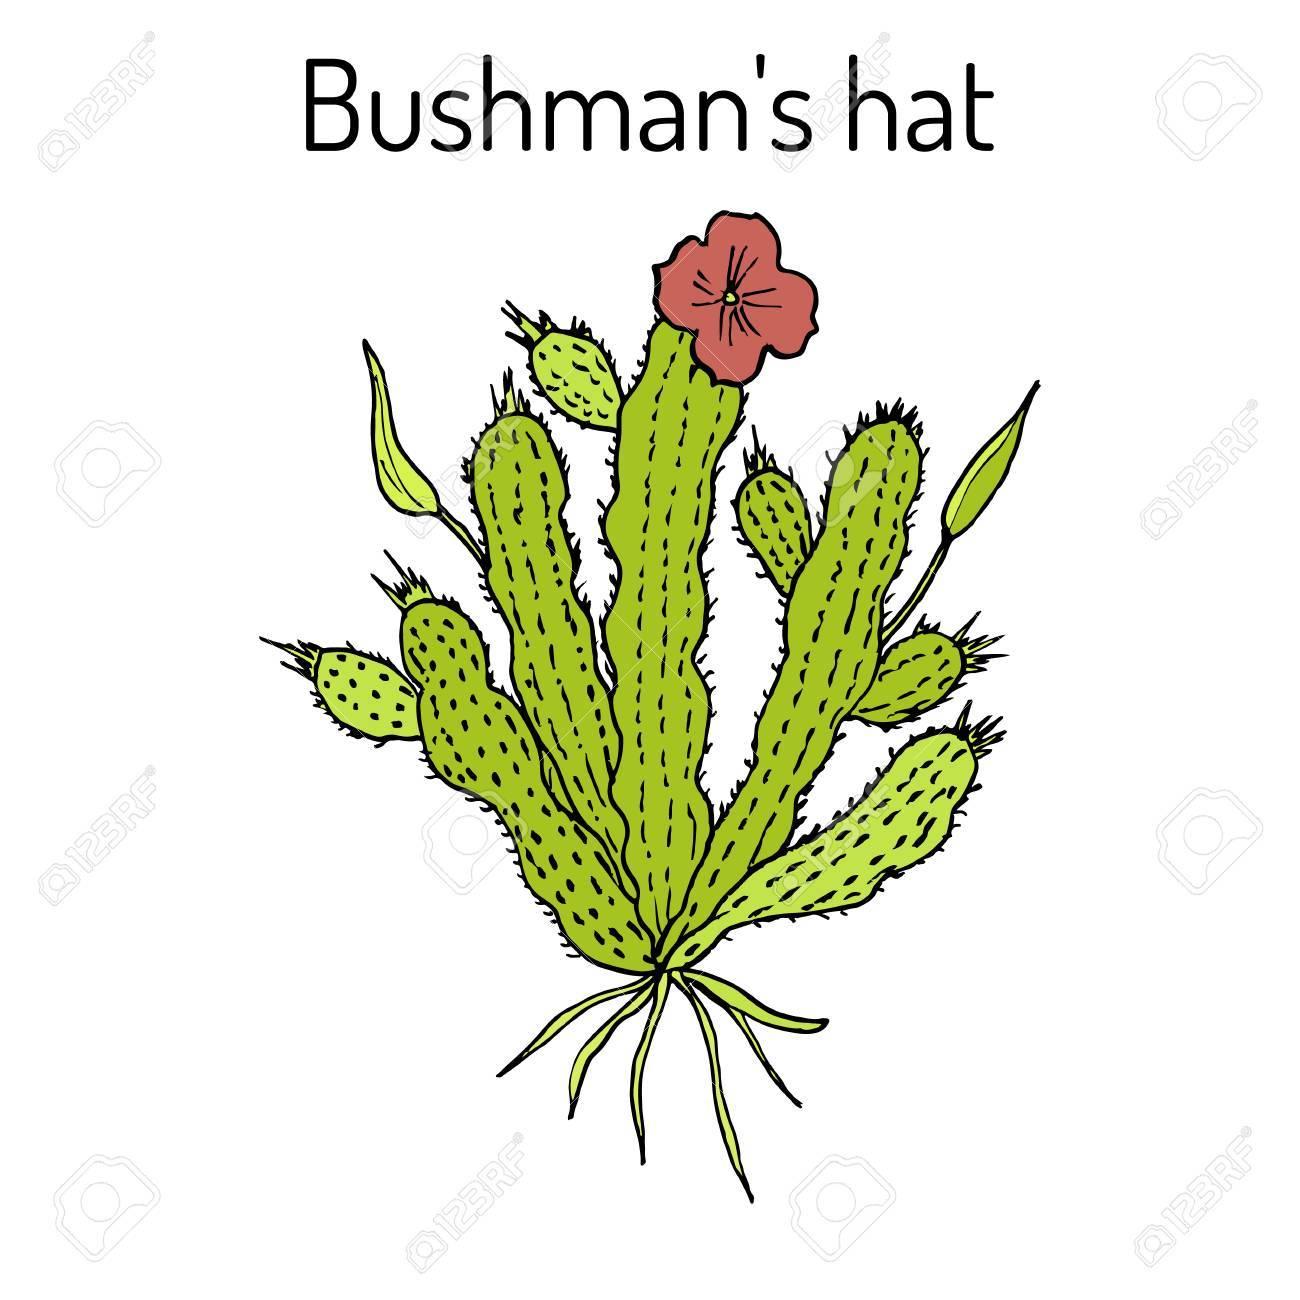 Bushmans Hat Hoodia Gordonii Medicinal Plant Stock Photo